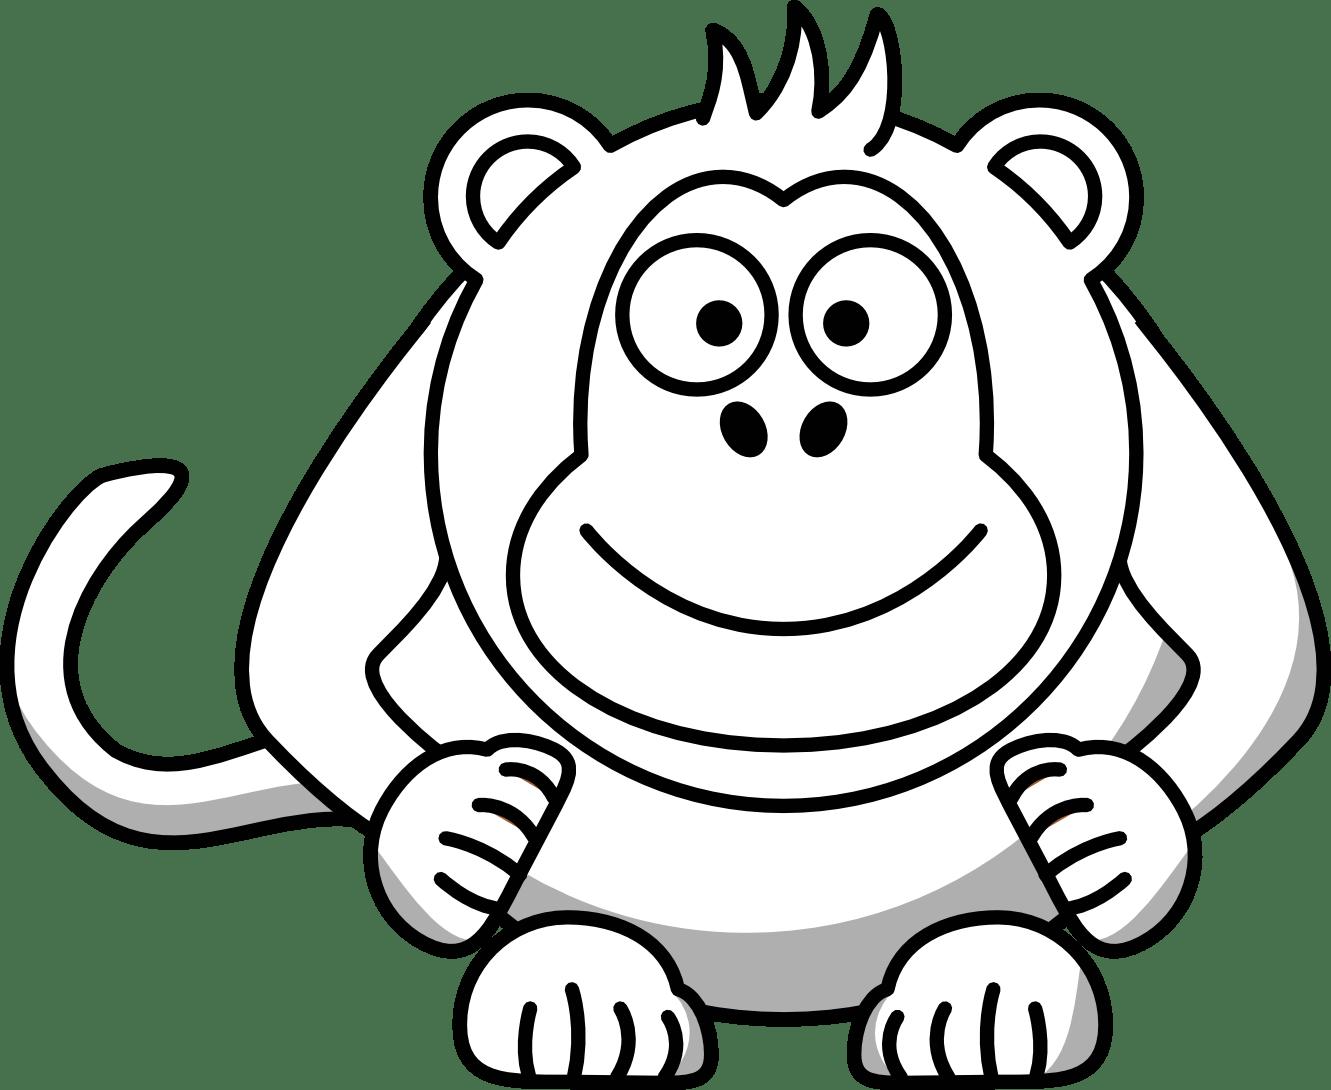 Monkey Clipart Black And White Clipart Panda